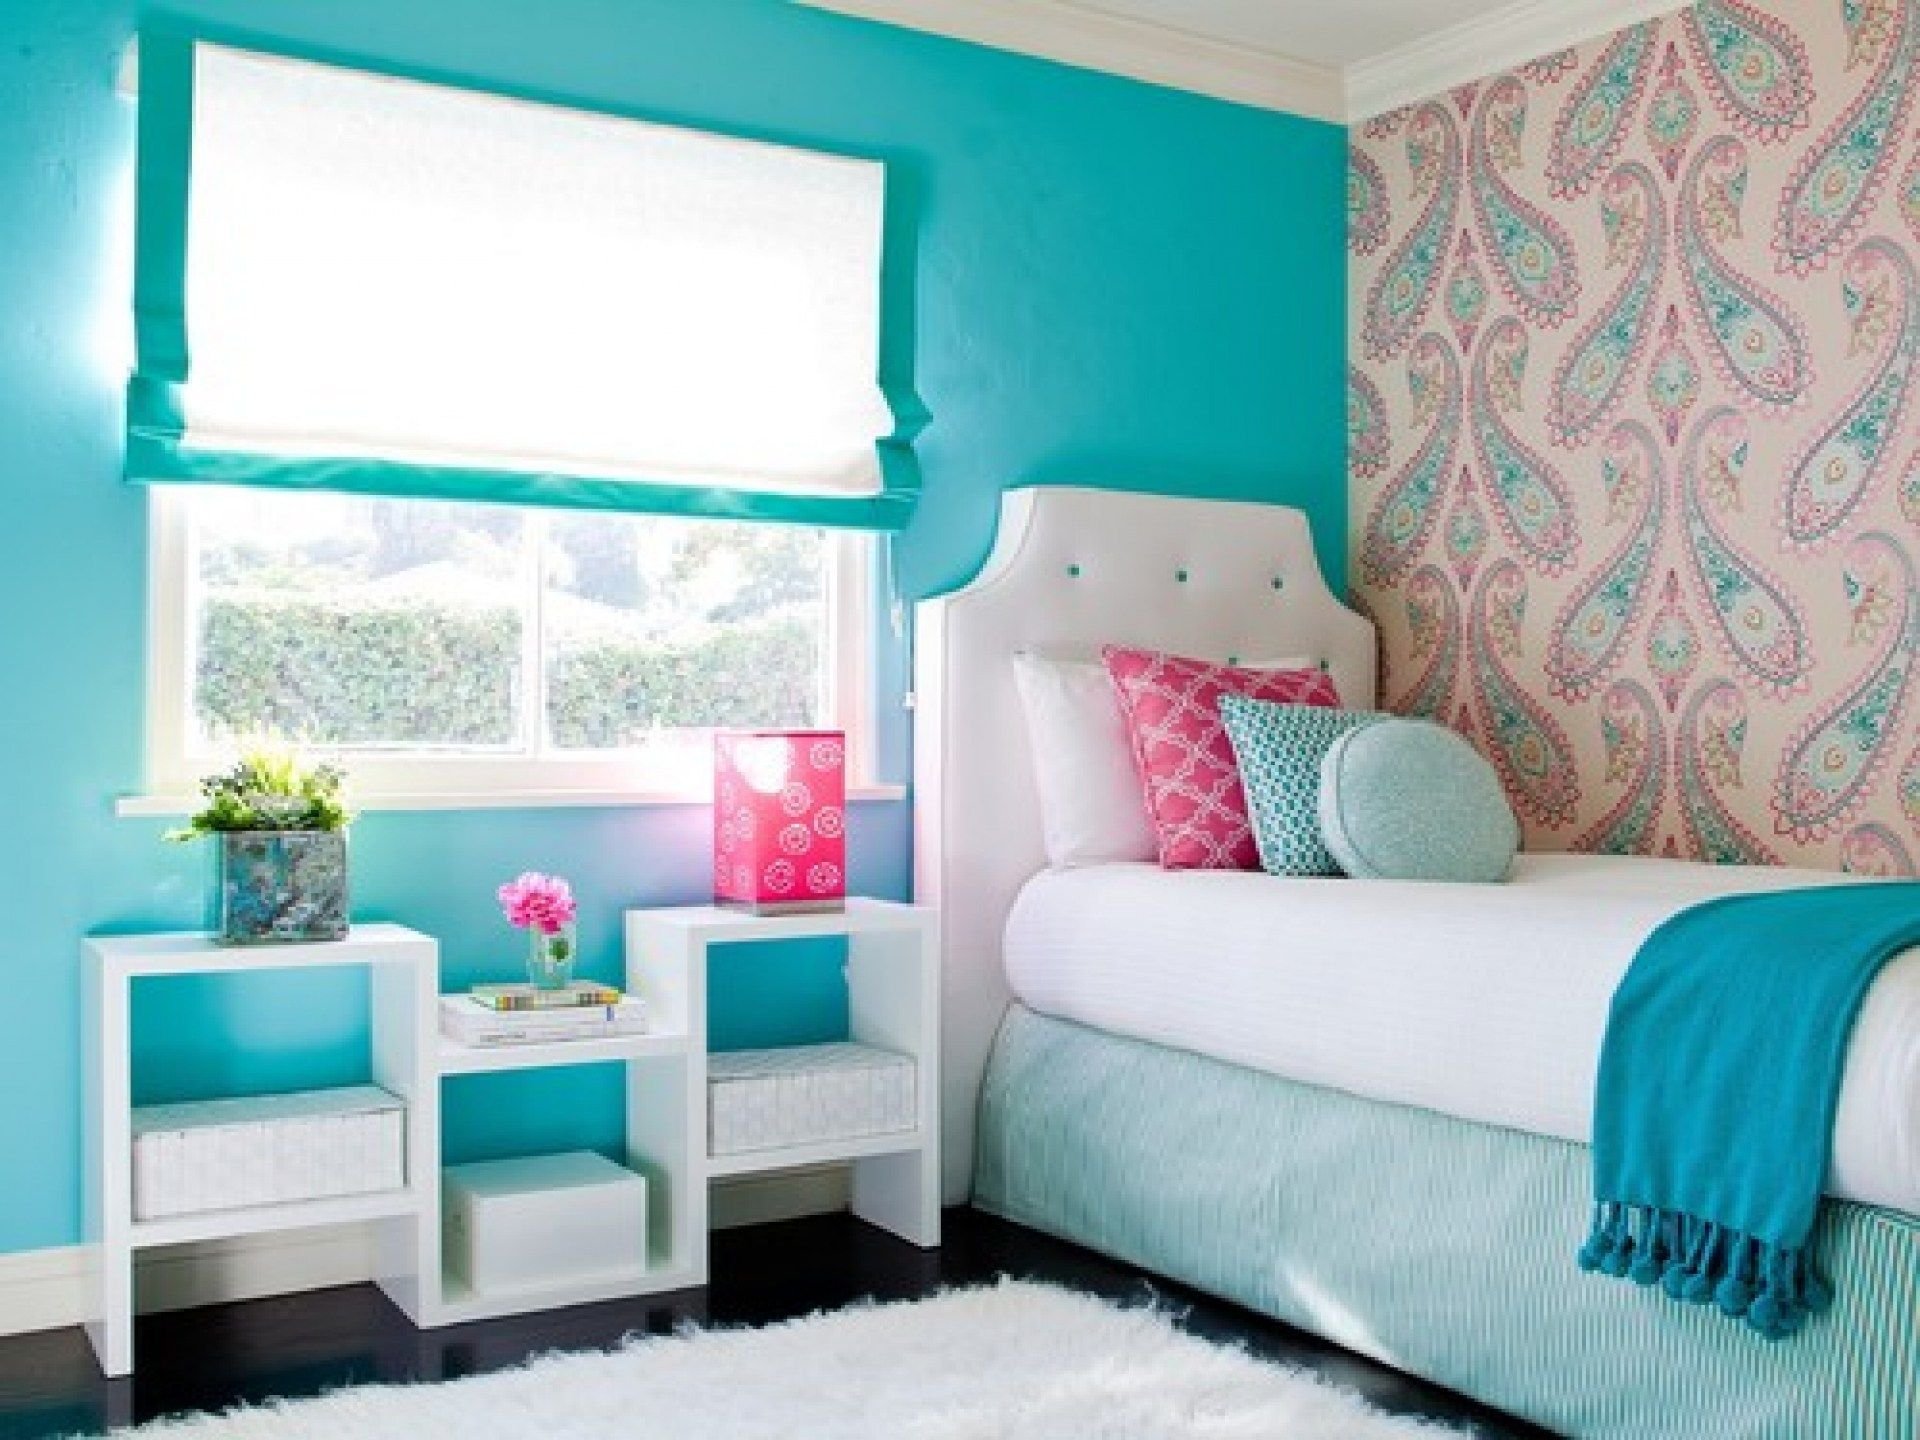 Bedroom Color Paint Ideas Design Girl Room Paint Ideas Design Ideas Bedroom Decorating Ideas Ideas